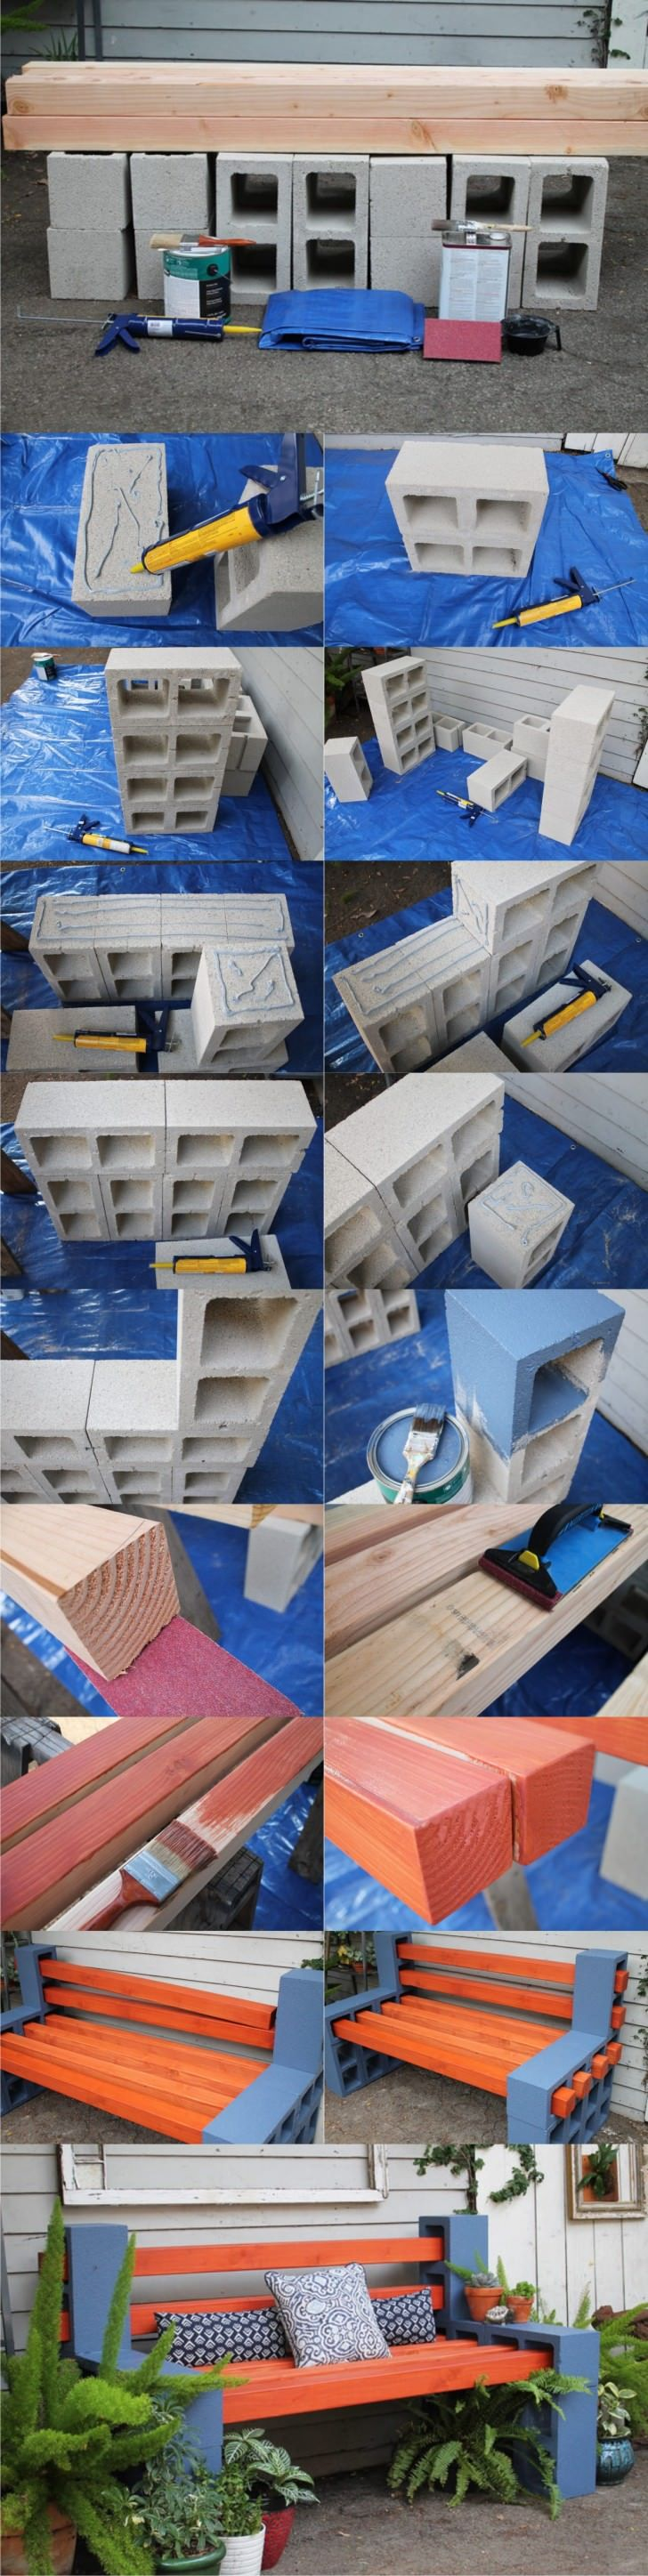 Diy Outdoor Bench From Concrete Blocks Wooden Slats Bancos  # Muebles Rial Asados